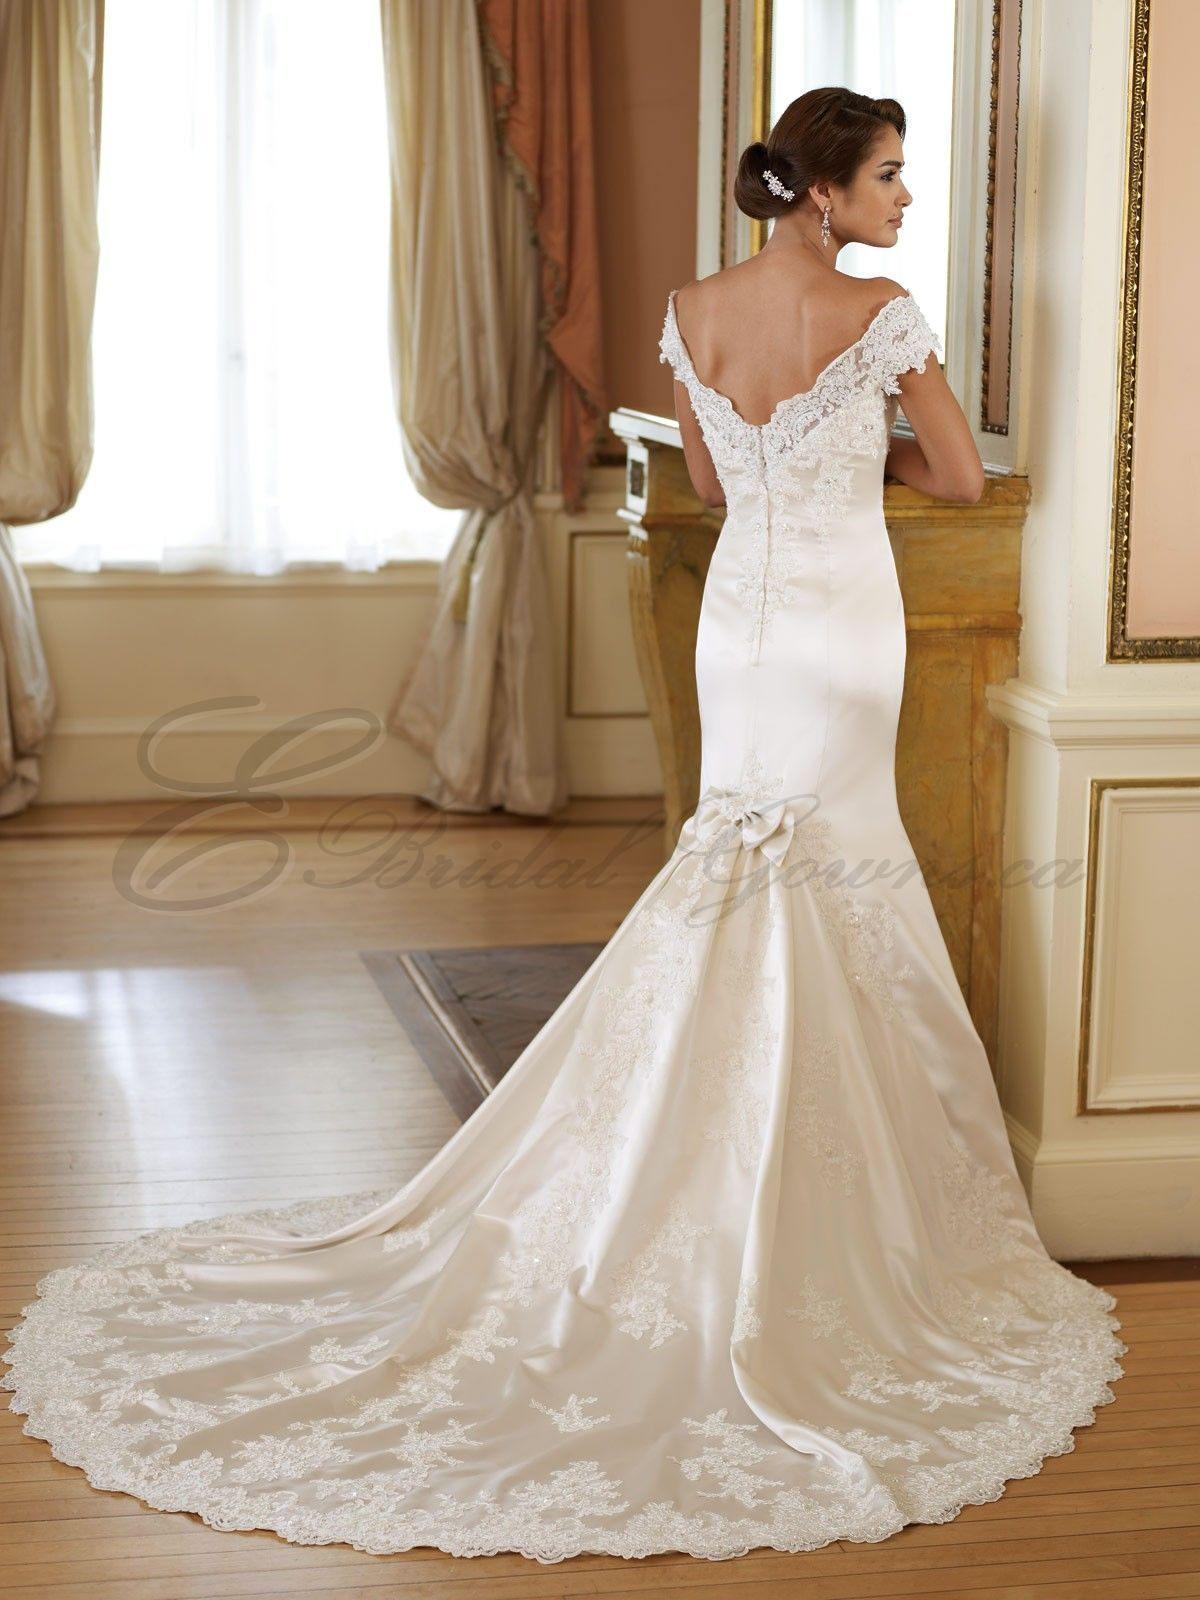 Crumb Catcher Wedding Dress Google Search Wedding Gowns Lace Wedding Dress Patterns Mccalls Wedding Dress Patterns [ 1600 x 1200 Pixel ]